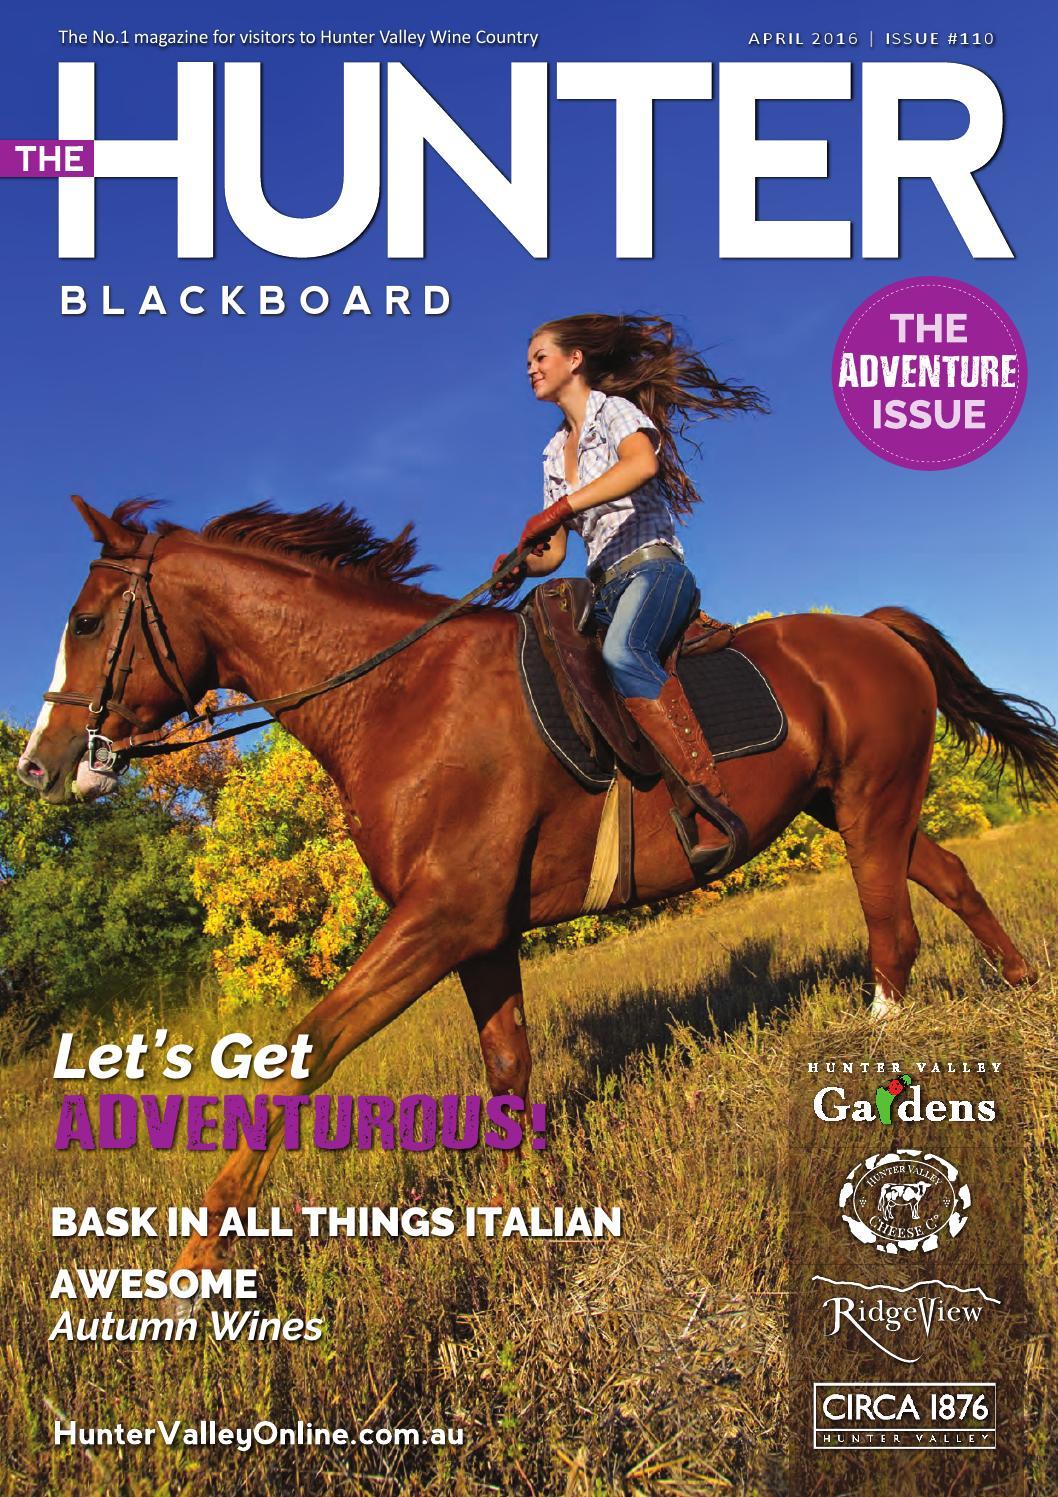 The Hunter Blackboard | April 2016 by WCP MEDIA | HUNTER VALLEY - issuu